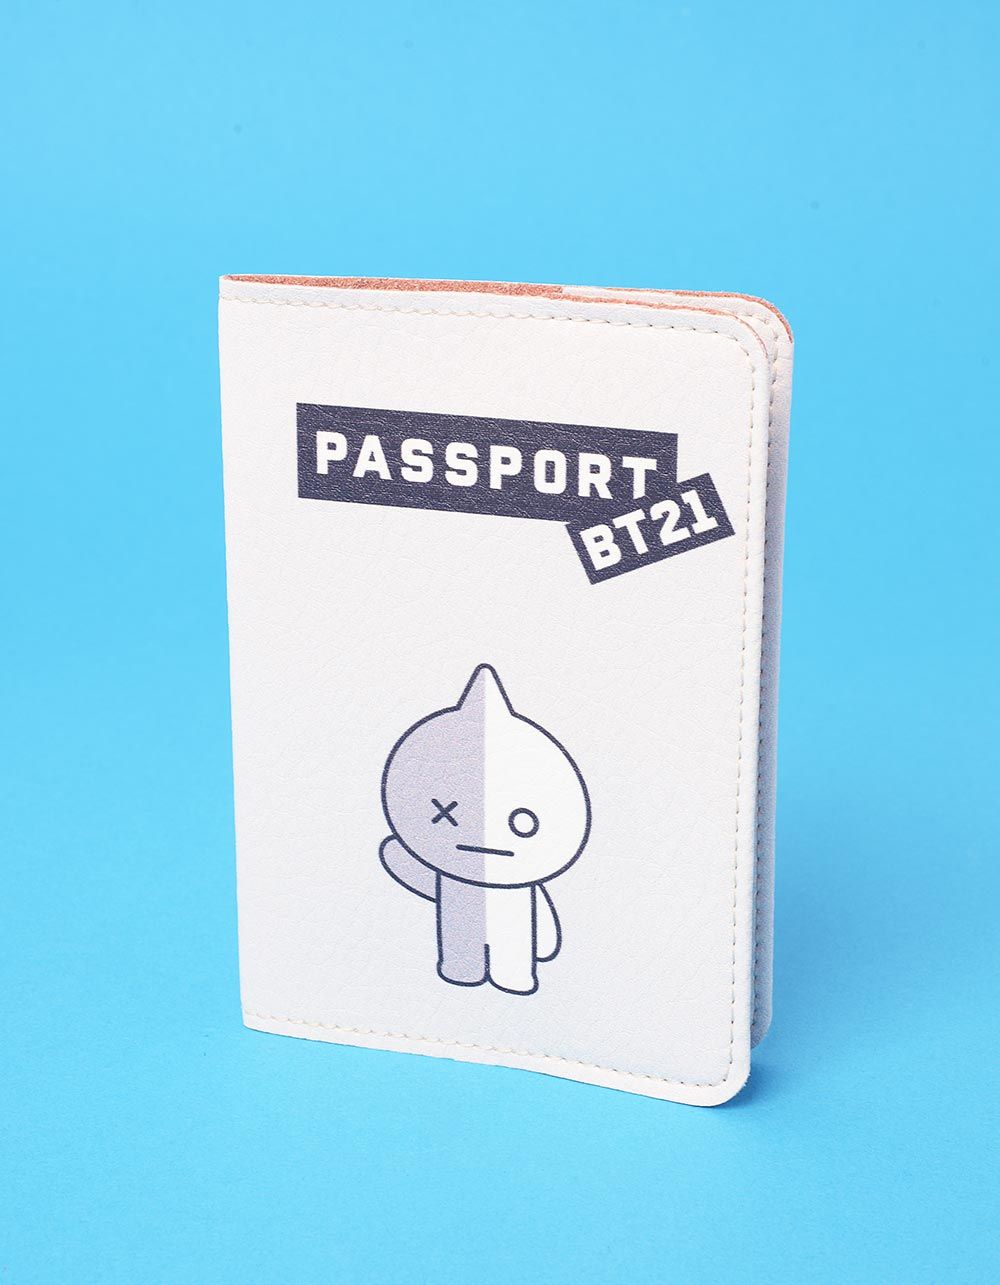 Обкладинка на паспорт з bts bt21   237247-11-XX